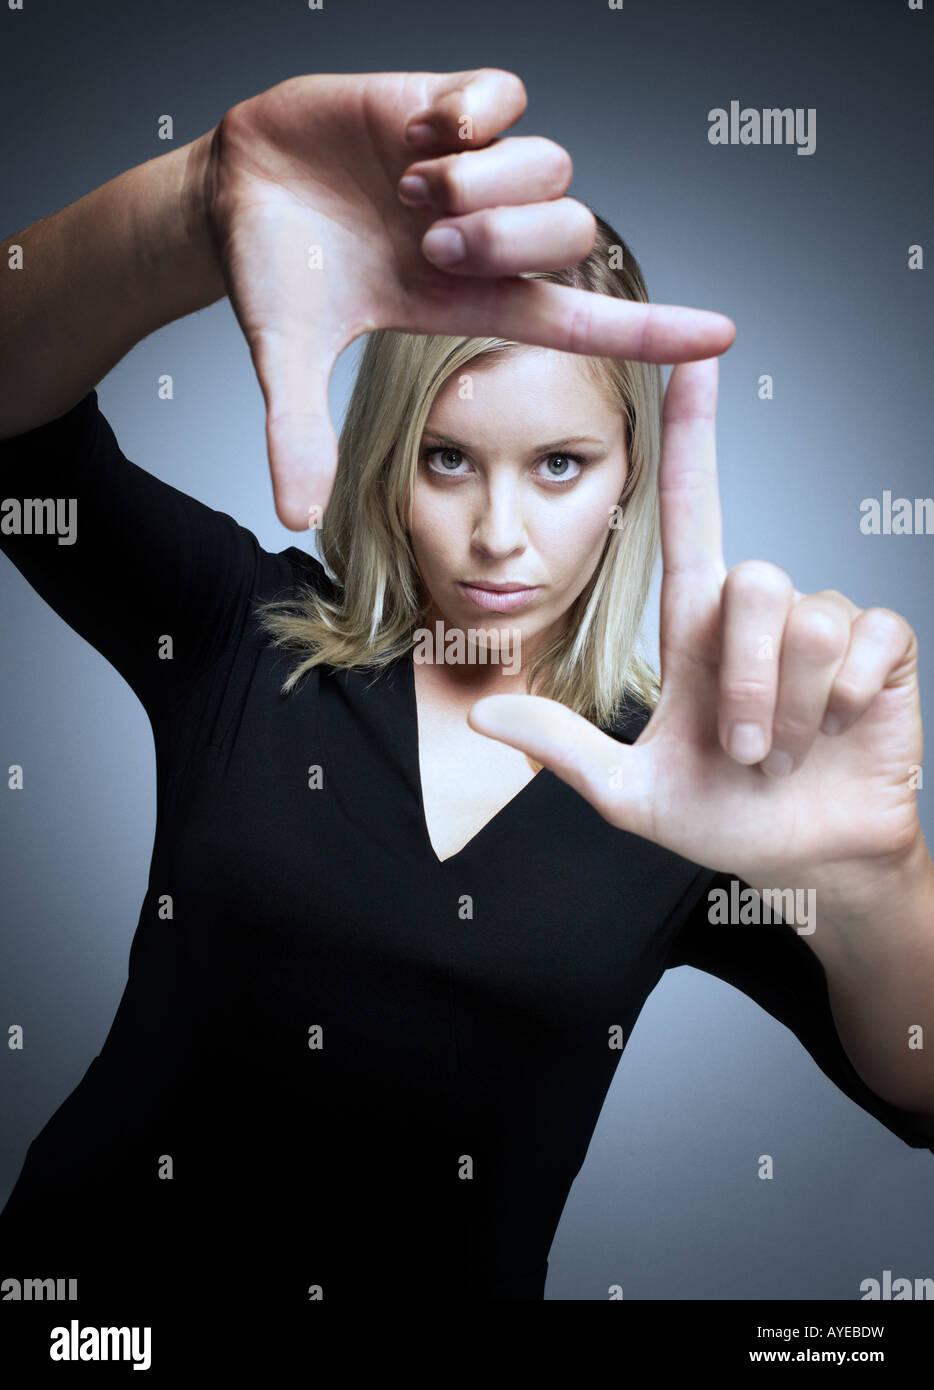 Woman loking through fingers - Stock Image